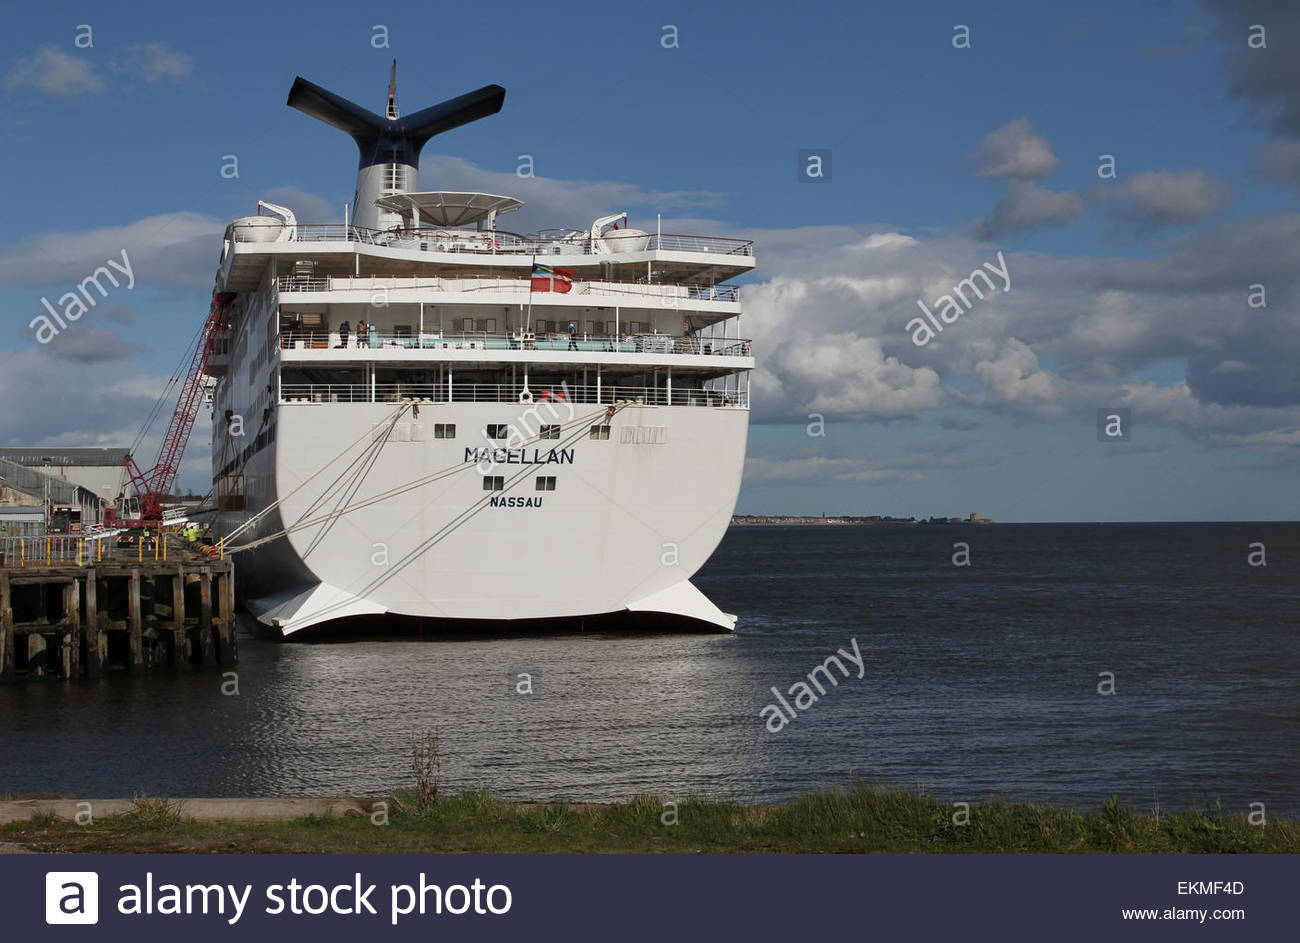 Dundee, UK. 12th April, 2015. CMV cruise ship Magellan docked in Dundee. Cruise and Maritime Voyages ship Magellan Stock Photo